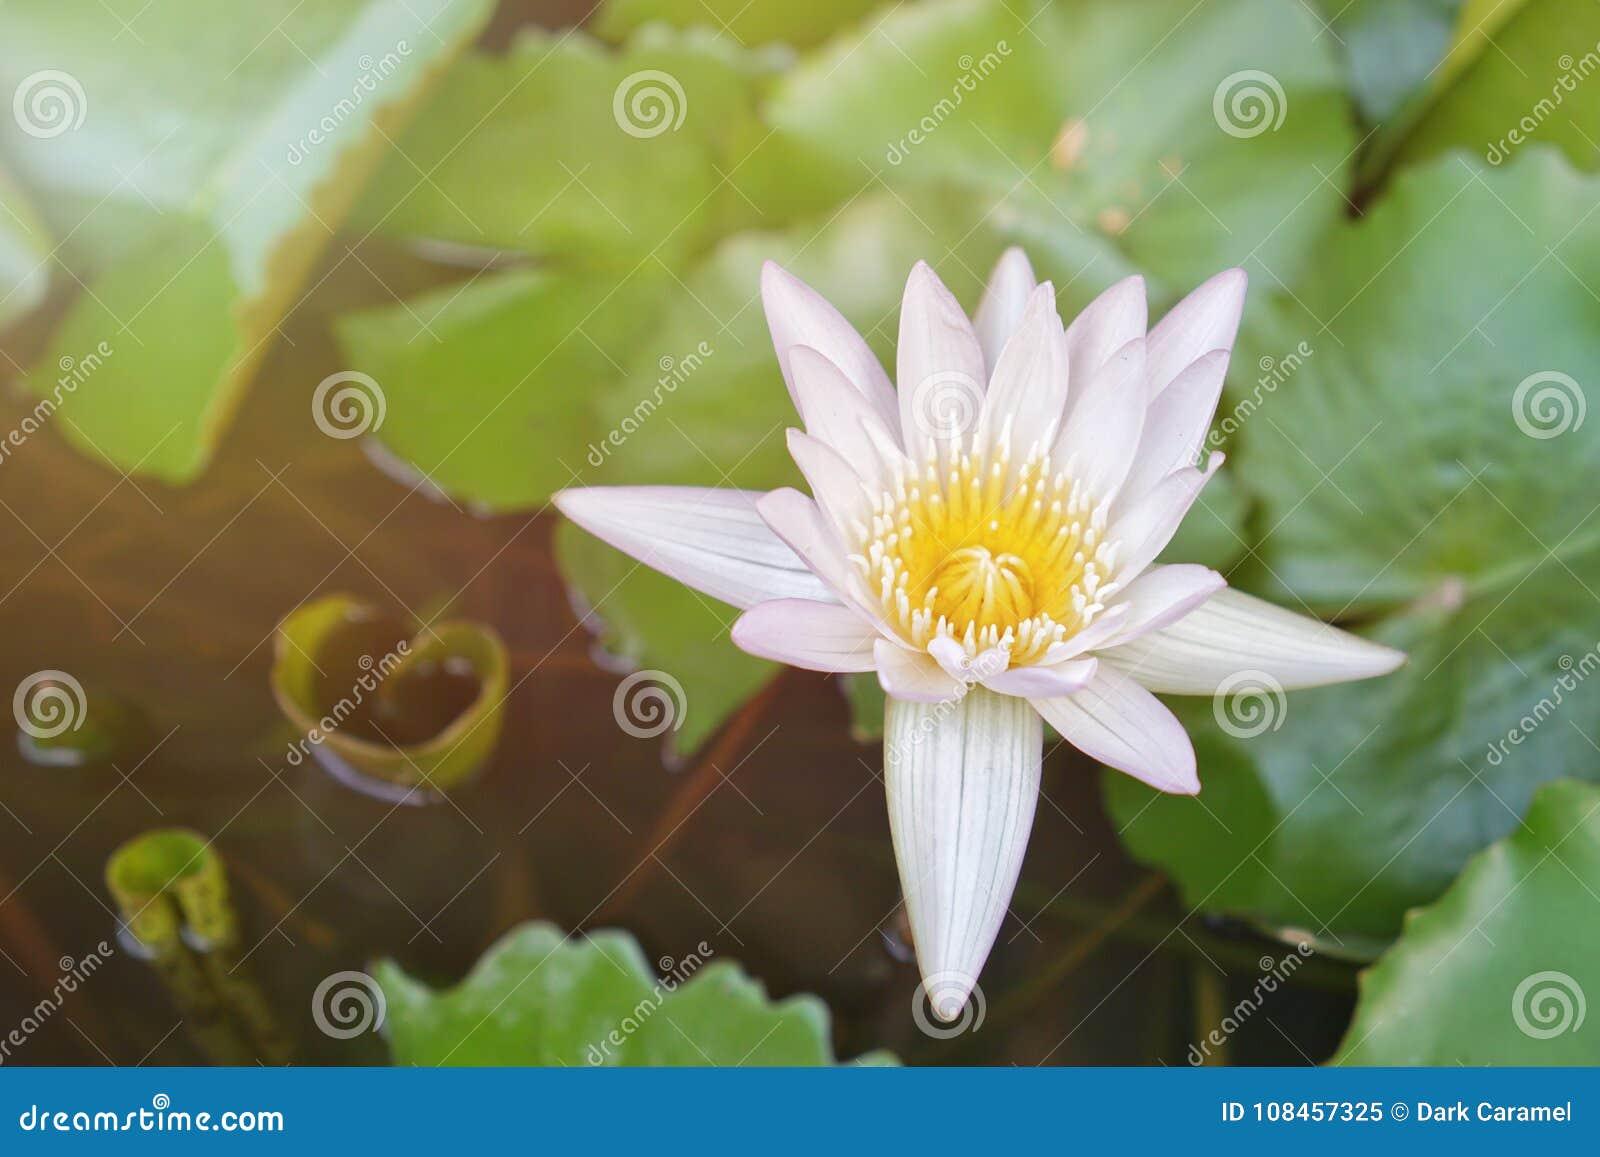 Beautiful White And Yellow Lotus Flowers Stock Image Image Of